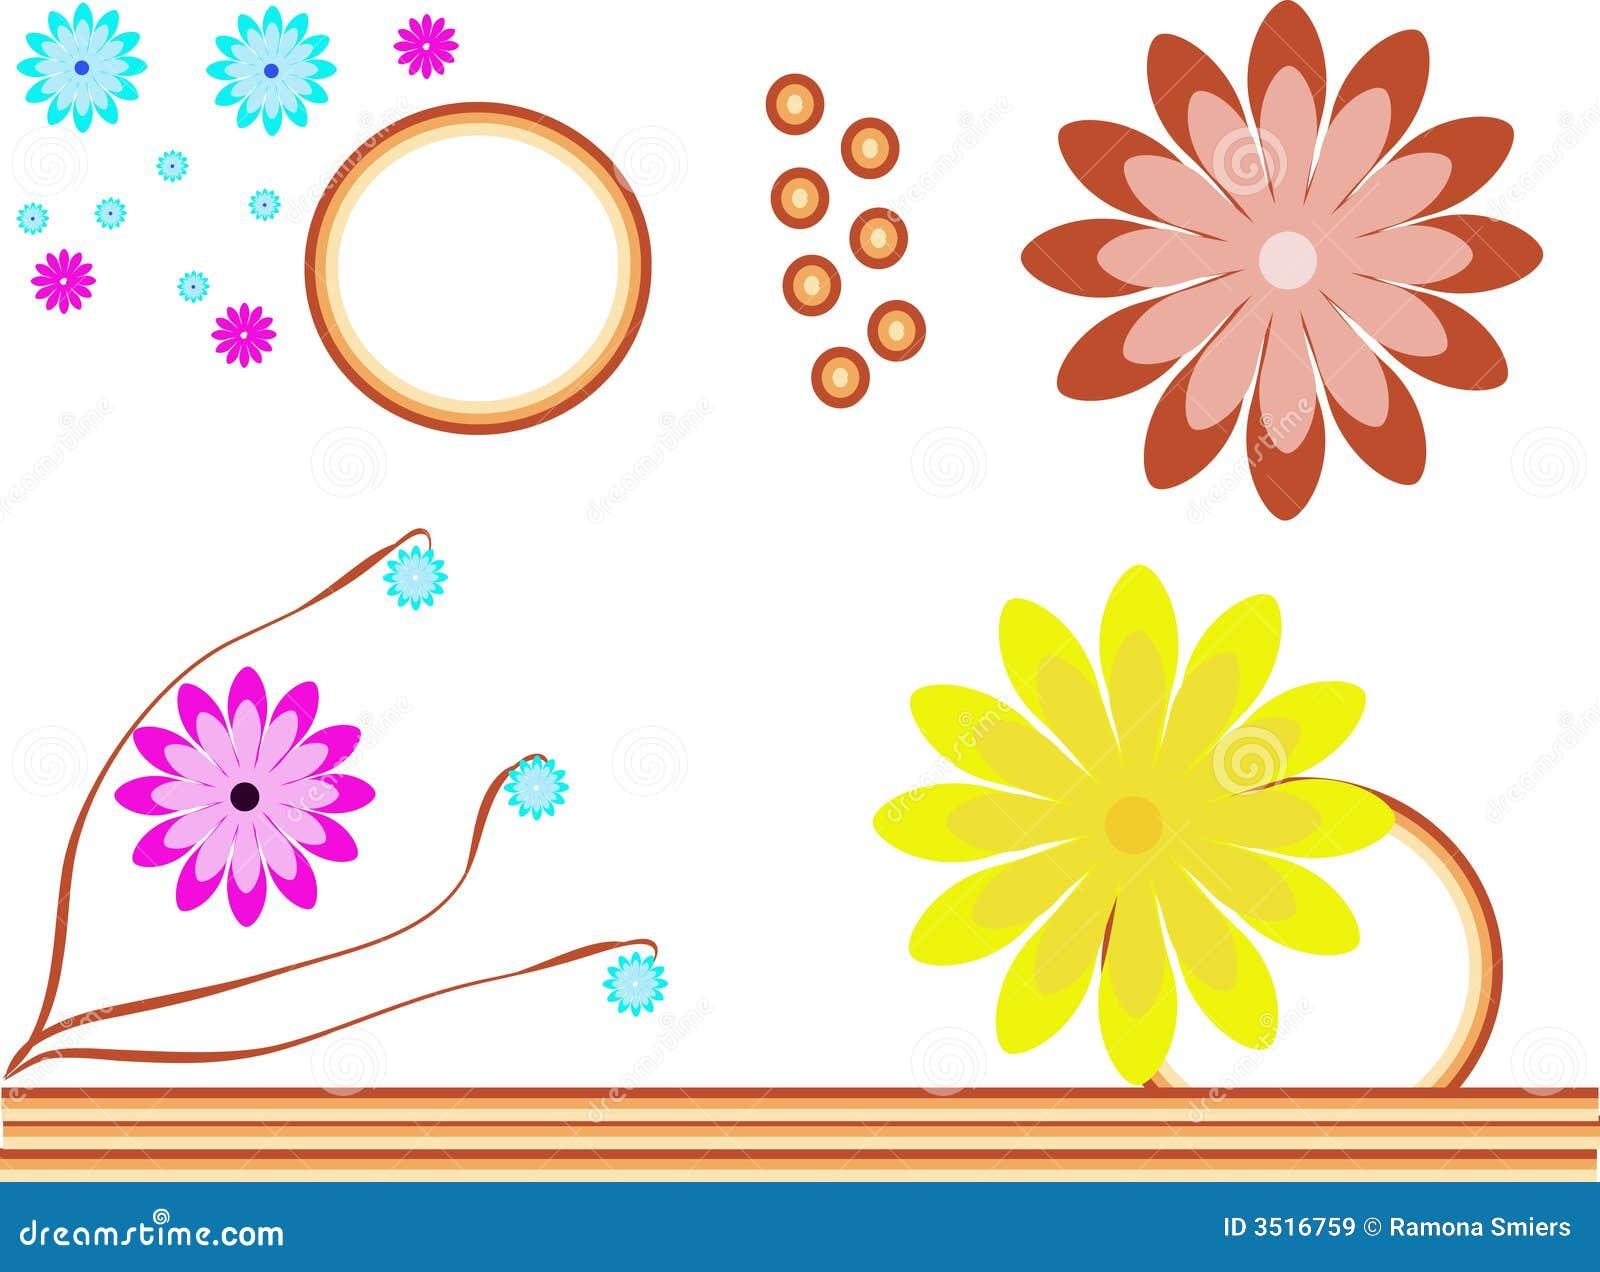 Colourful flowers illustration